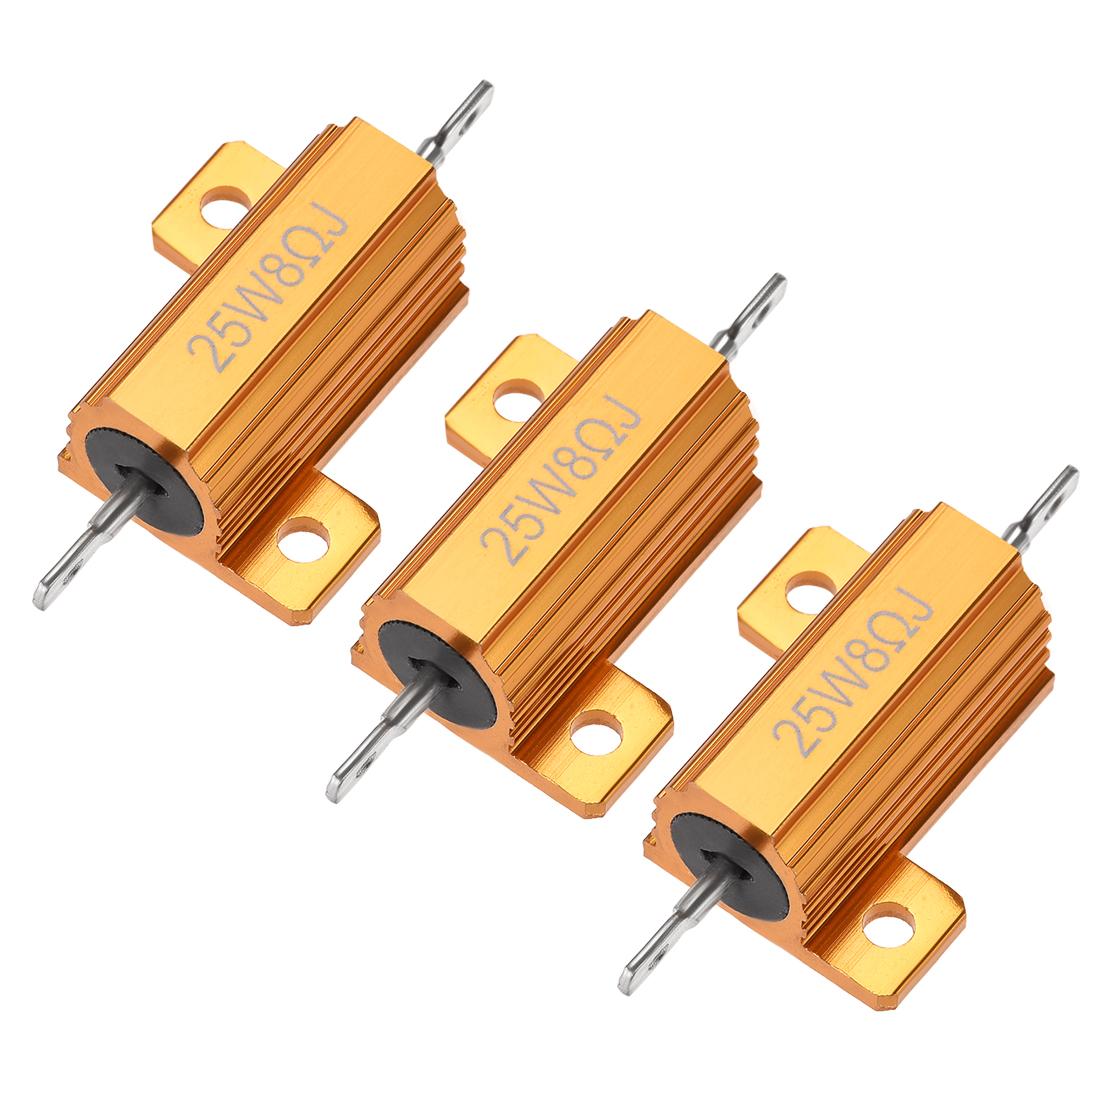 25W 8 Ohm 5% Aluminum Housing Resistor Wirewound Resistor Gold Tone 3 Pcs